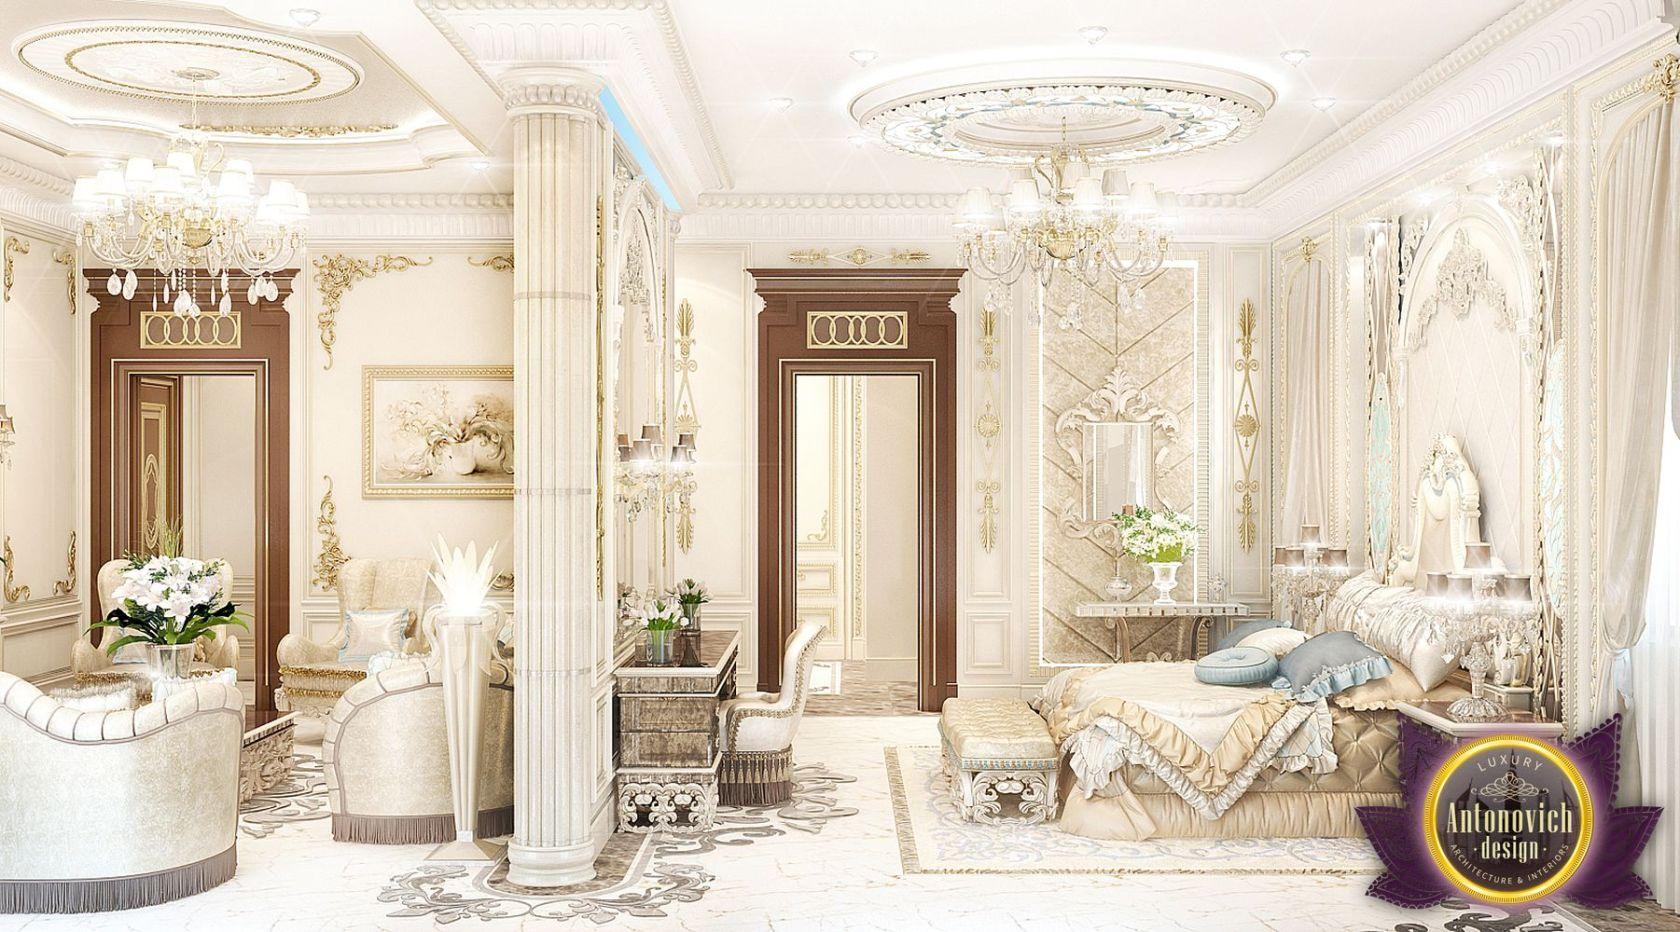 luxurious arabic style bedroom Luxury Royal Arabic Master Bedroom of Luxury Antonovich